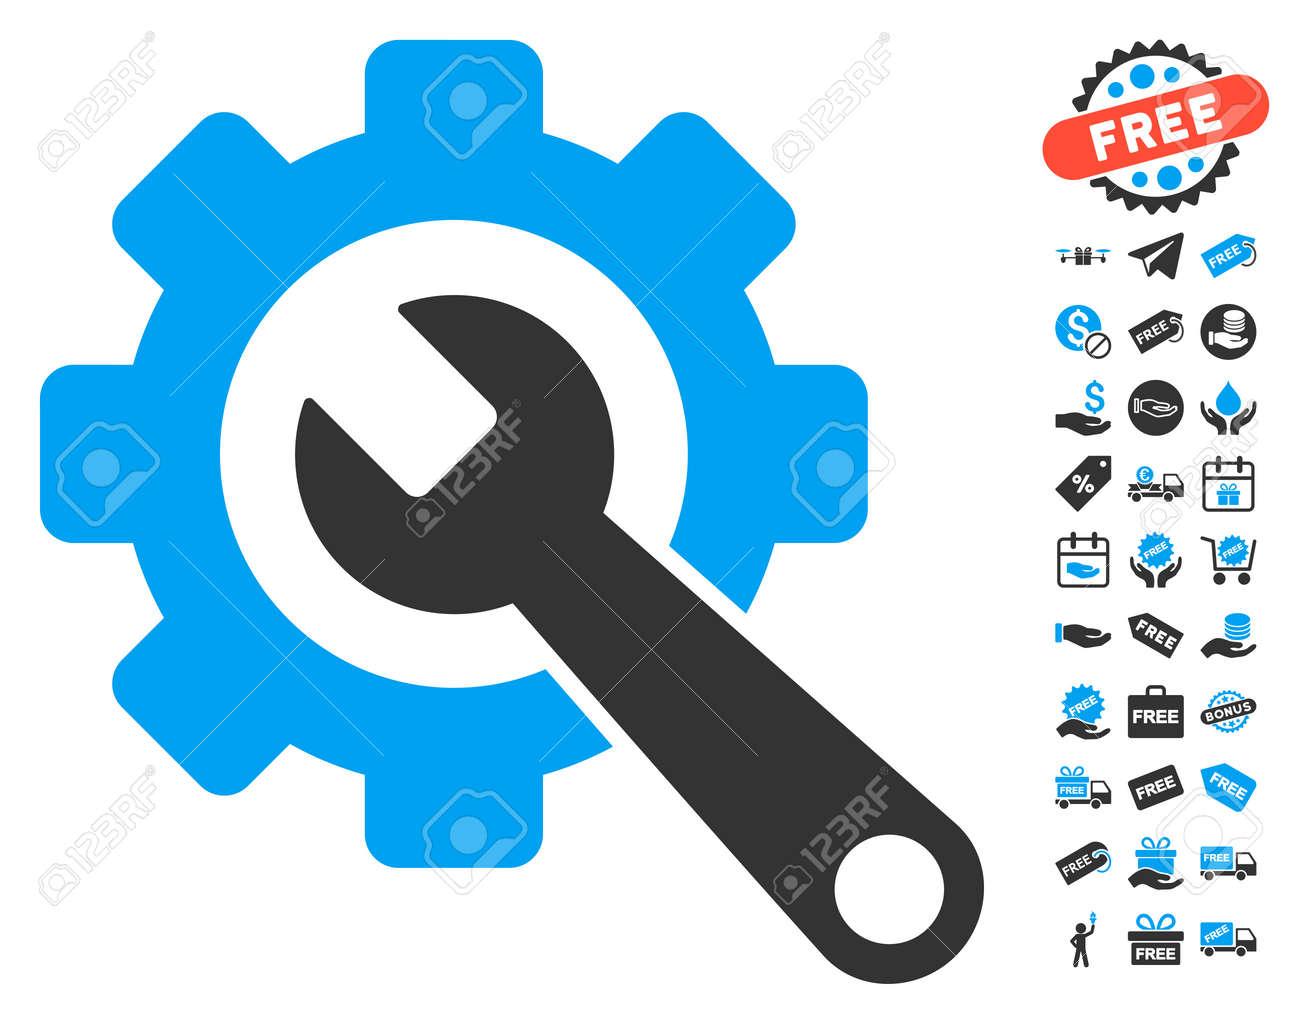 Gear and wrench icon with free bonus symbols vector illustration gear and wrench icon with free bonus symbols vector illustration style is flat iconic symbols biocorpaavc Images